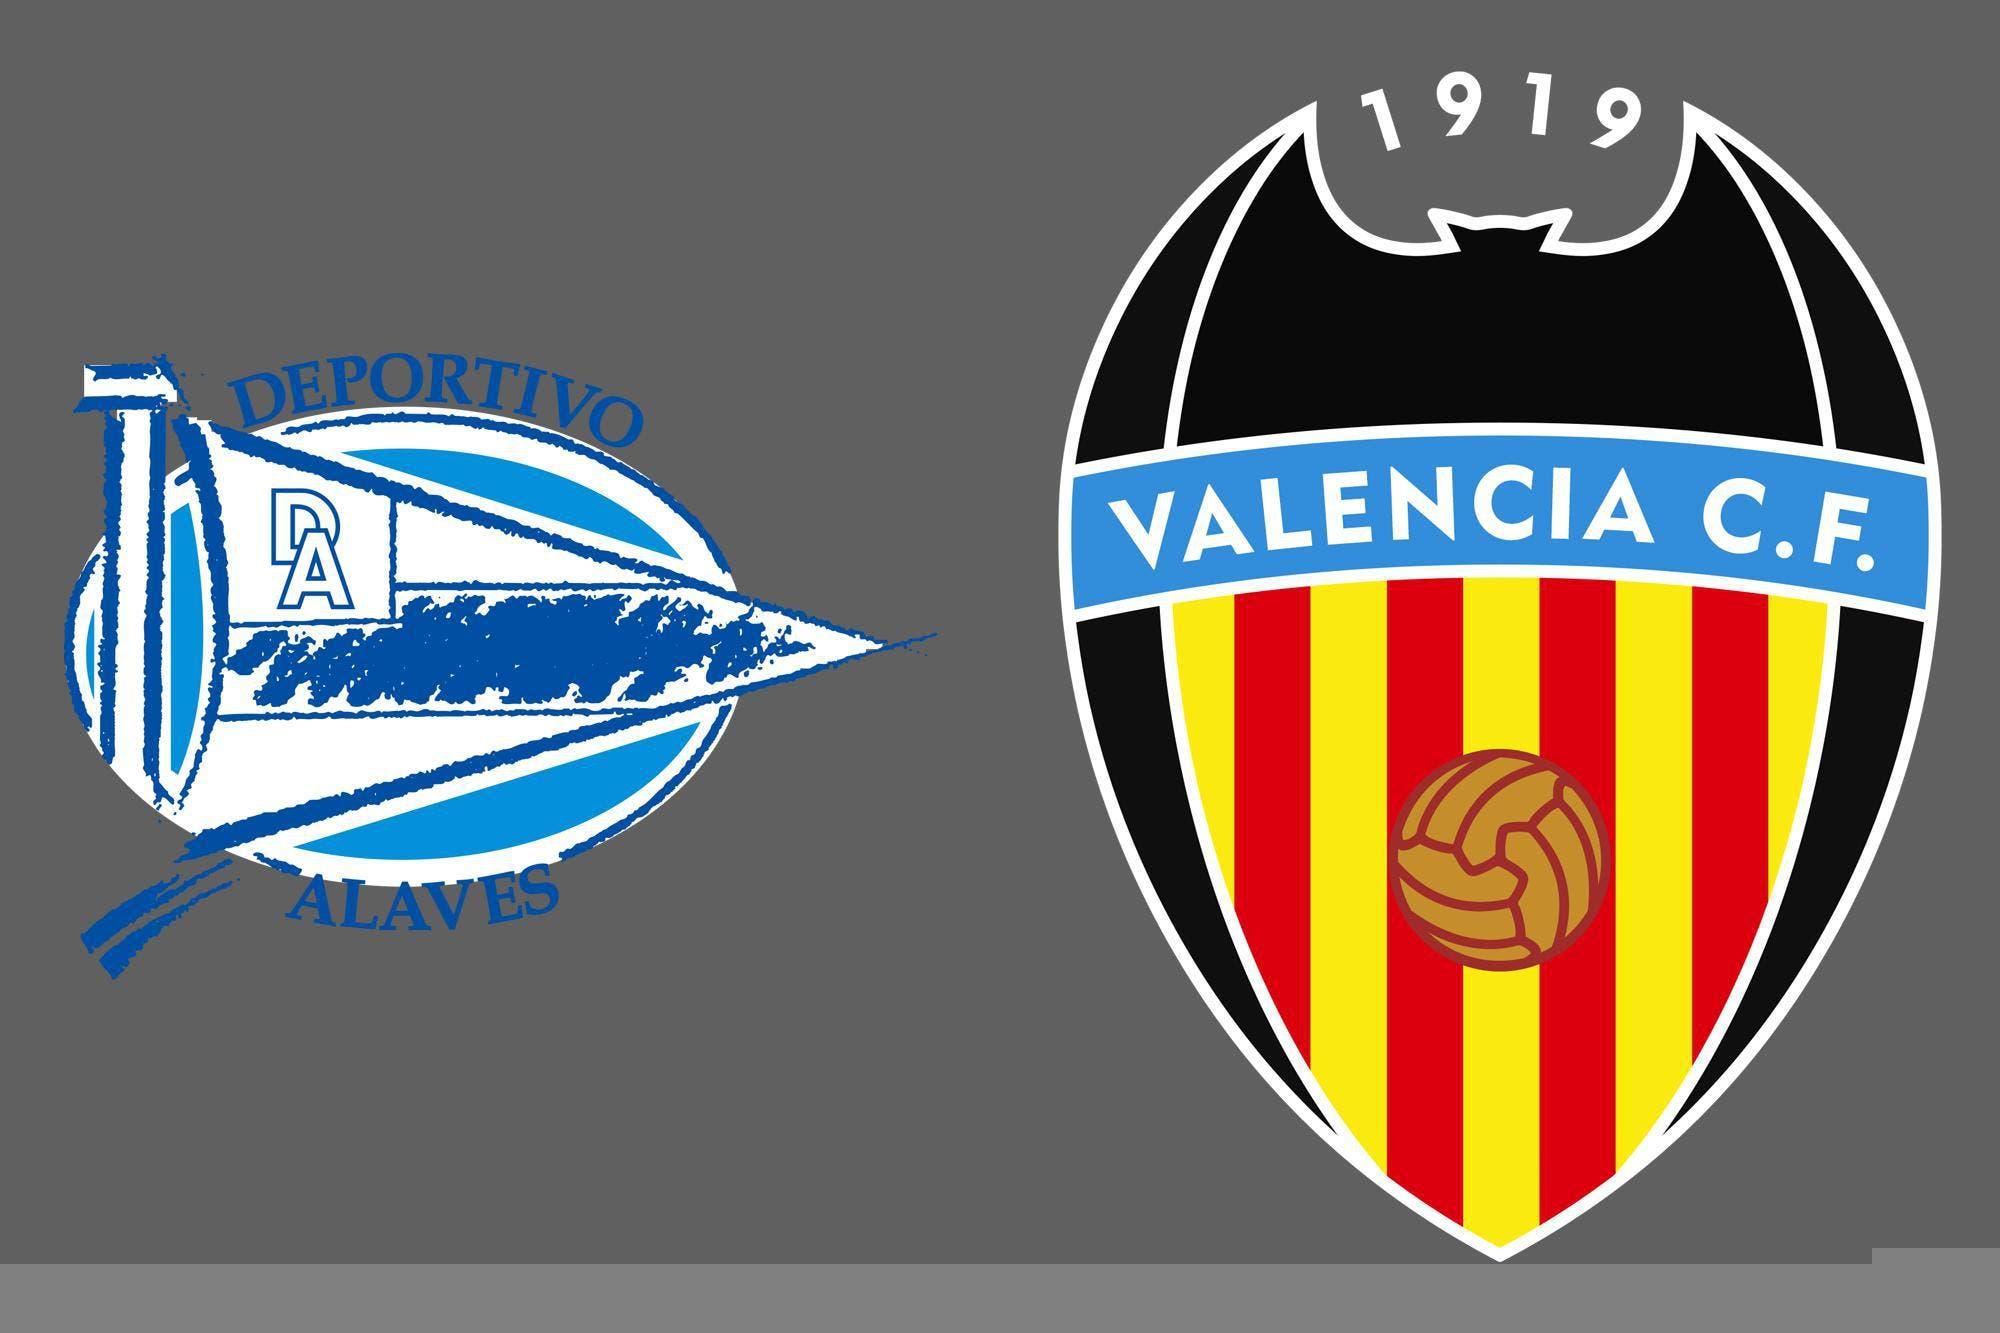 Liga de España: Alavés y Valencia empataron 2-2